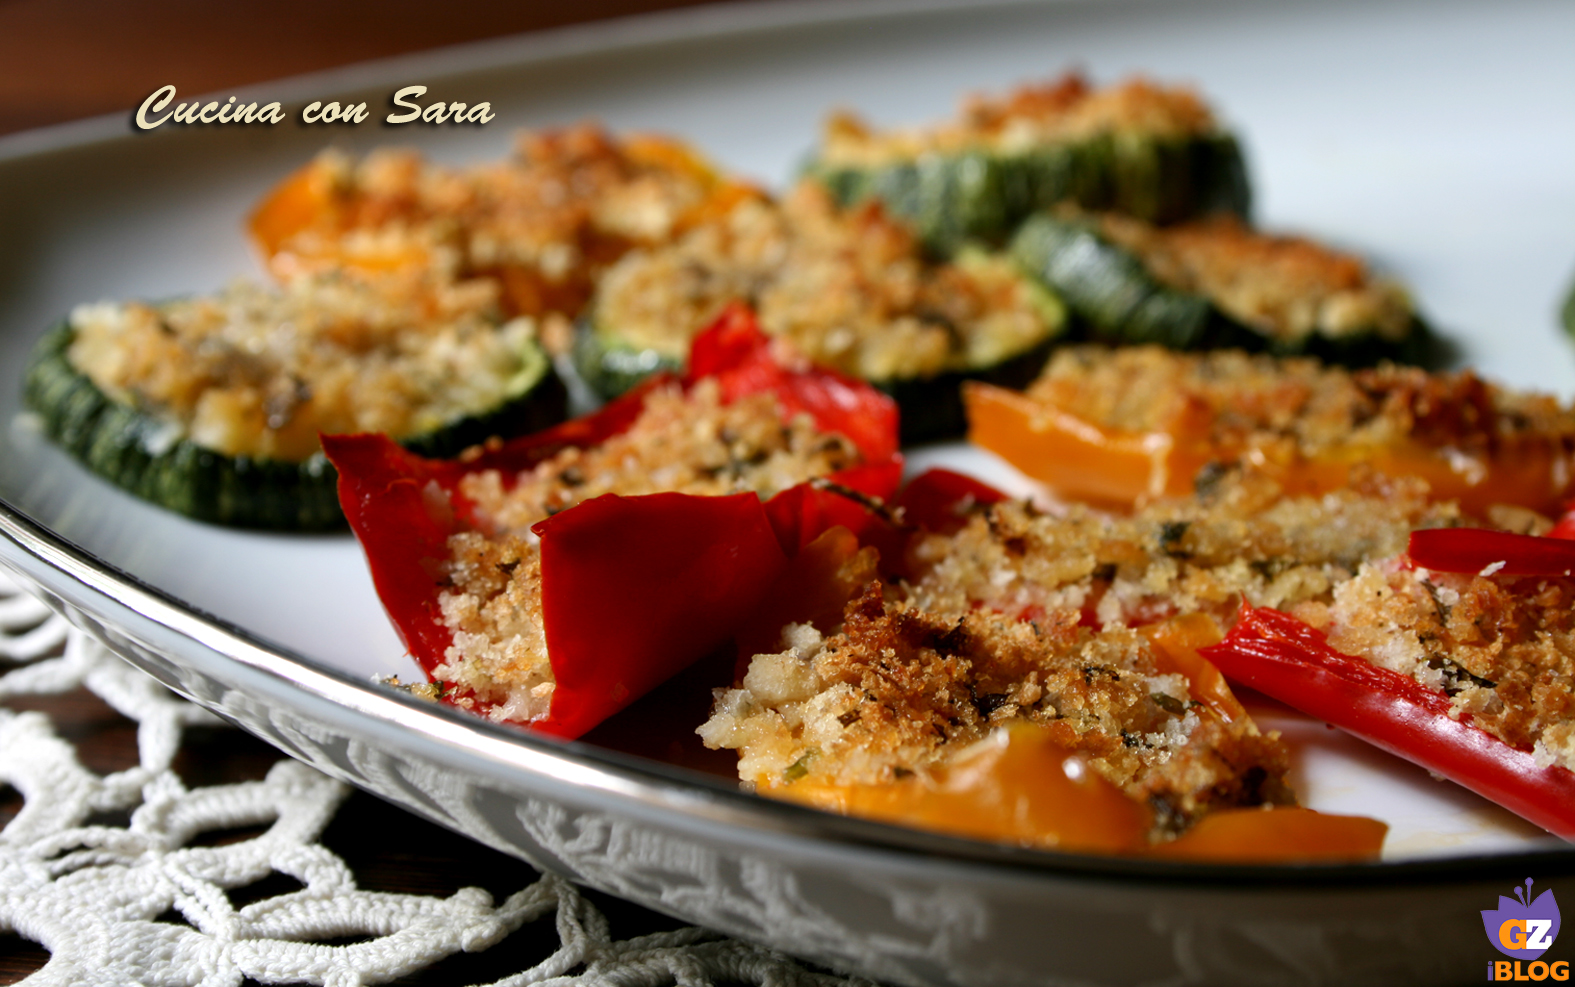 Verdure gratinate al forno cucina con sara - Cucina con sara ...